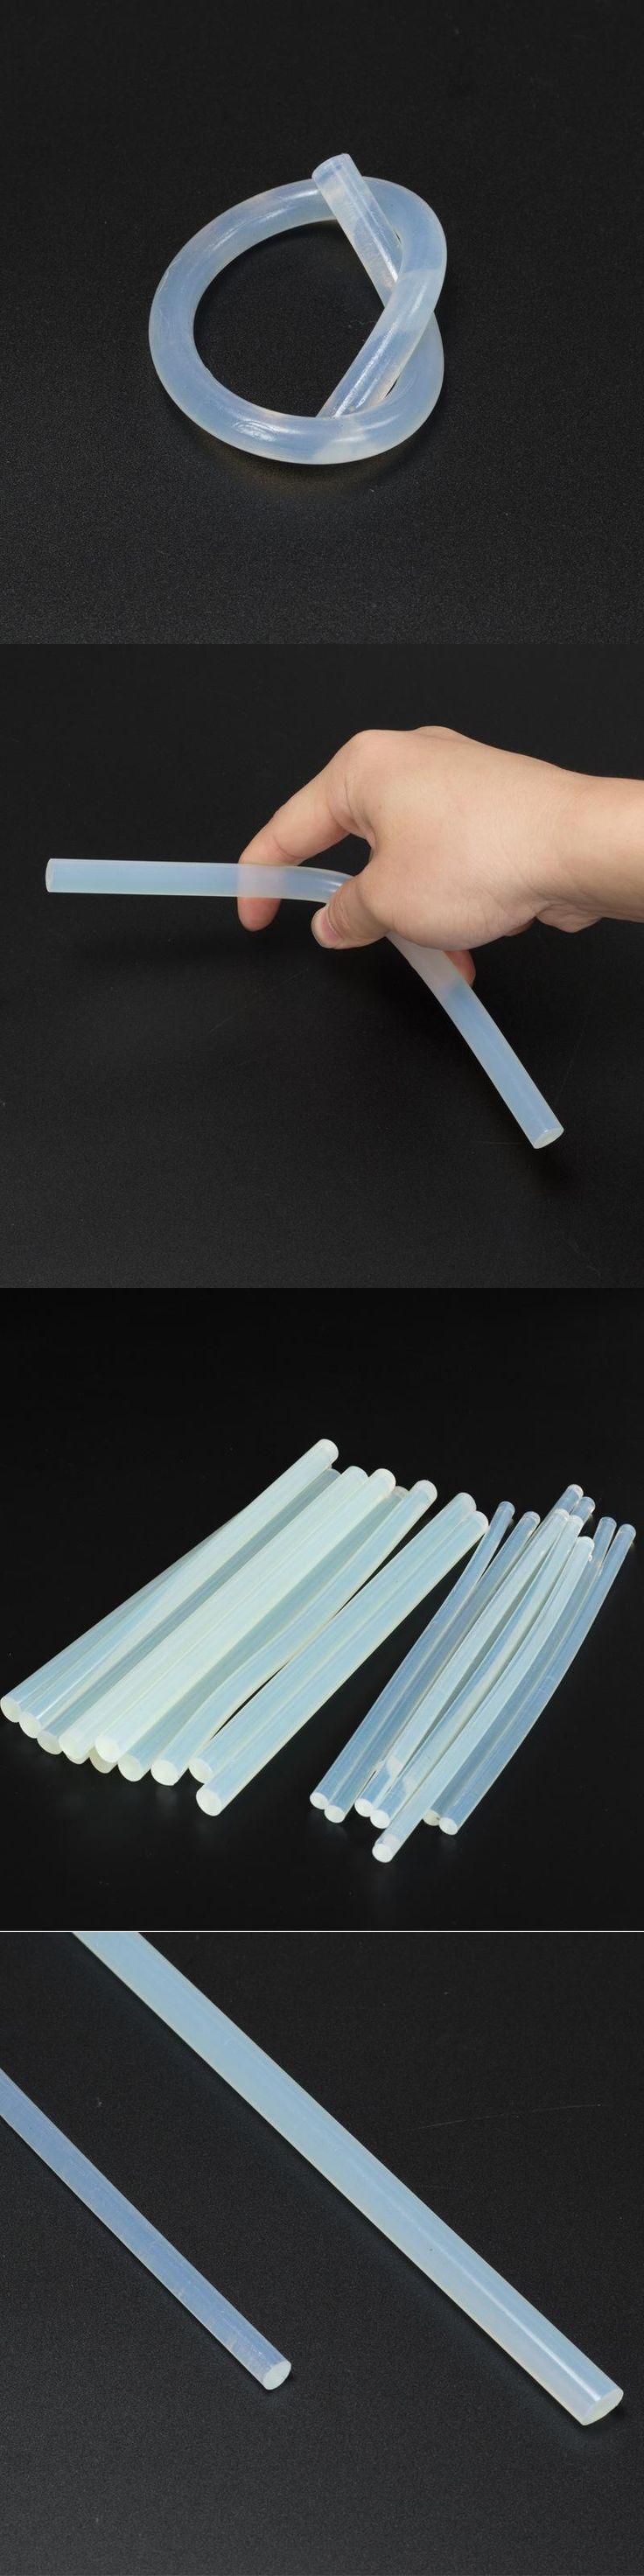 Hot Melt Adhesive Rods 7 * 220MM And 11 * 220MM White Transparent Hot Melt Adhesive Bar Technology Album Crafts Maintenance Tool